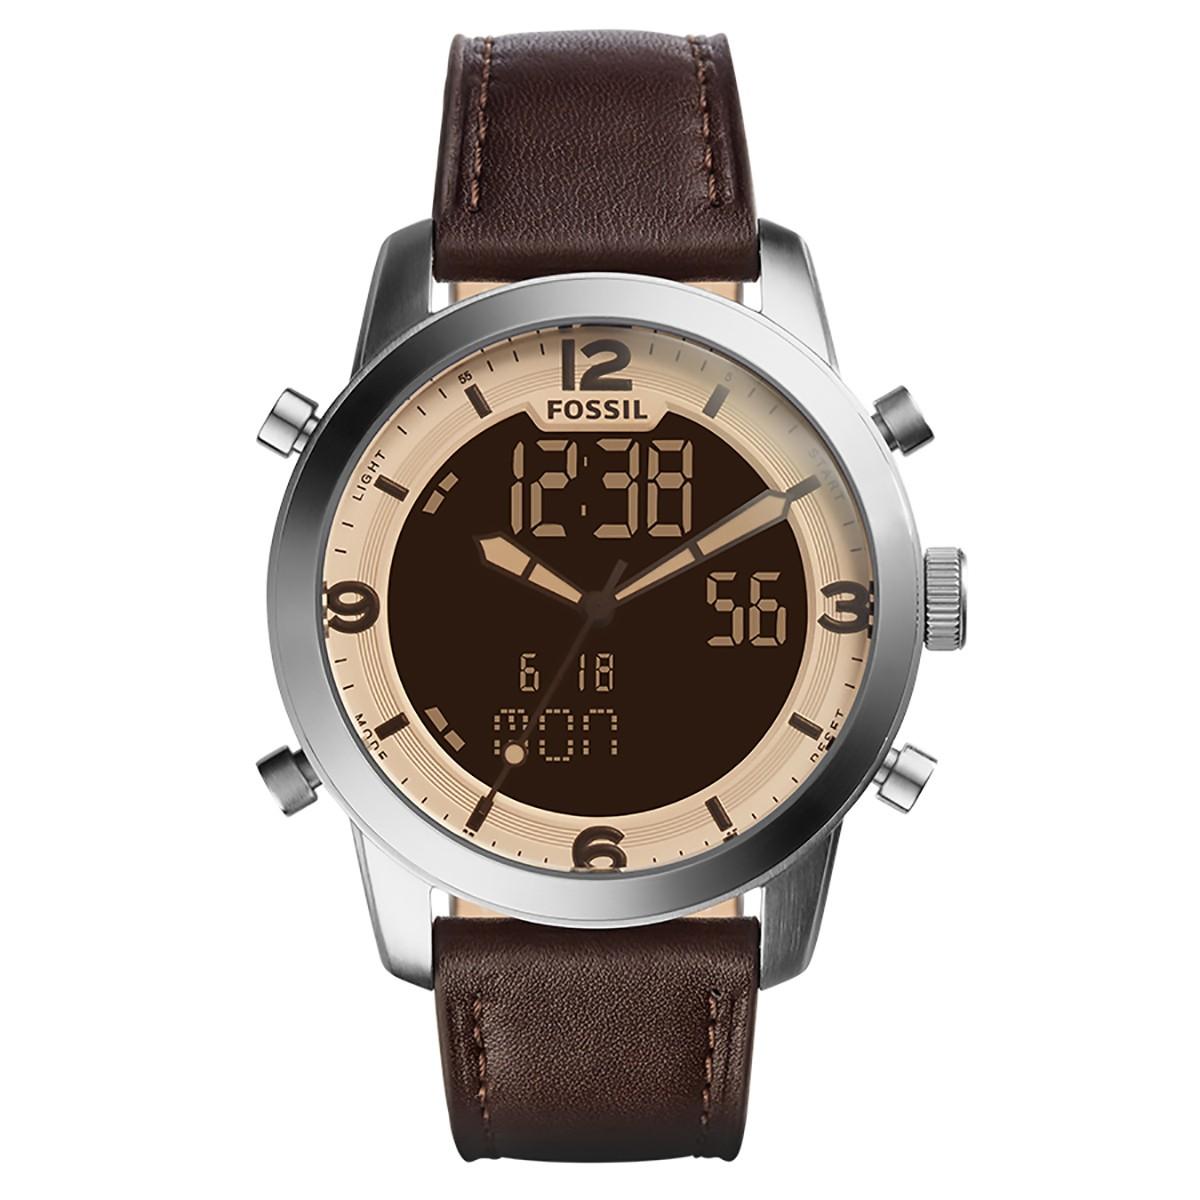 5eb6eff2c23b6 Compre Relógio Masculino Fossil Pilot em 10X   Tri-Jóia Shop